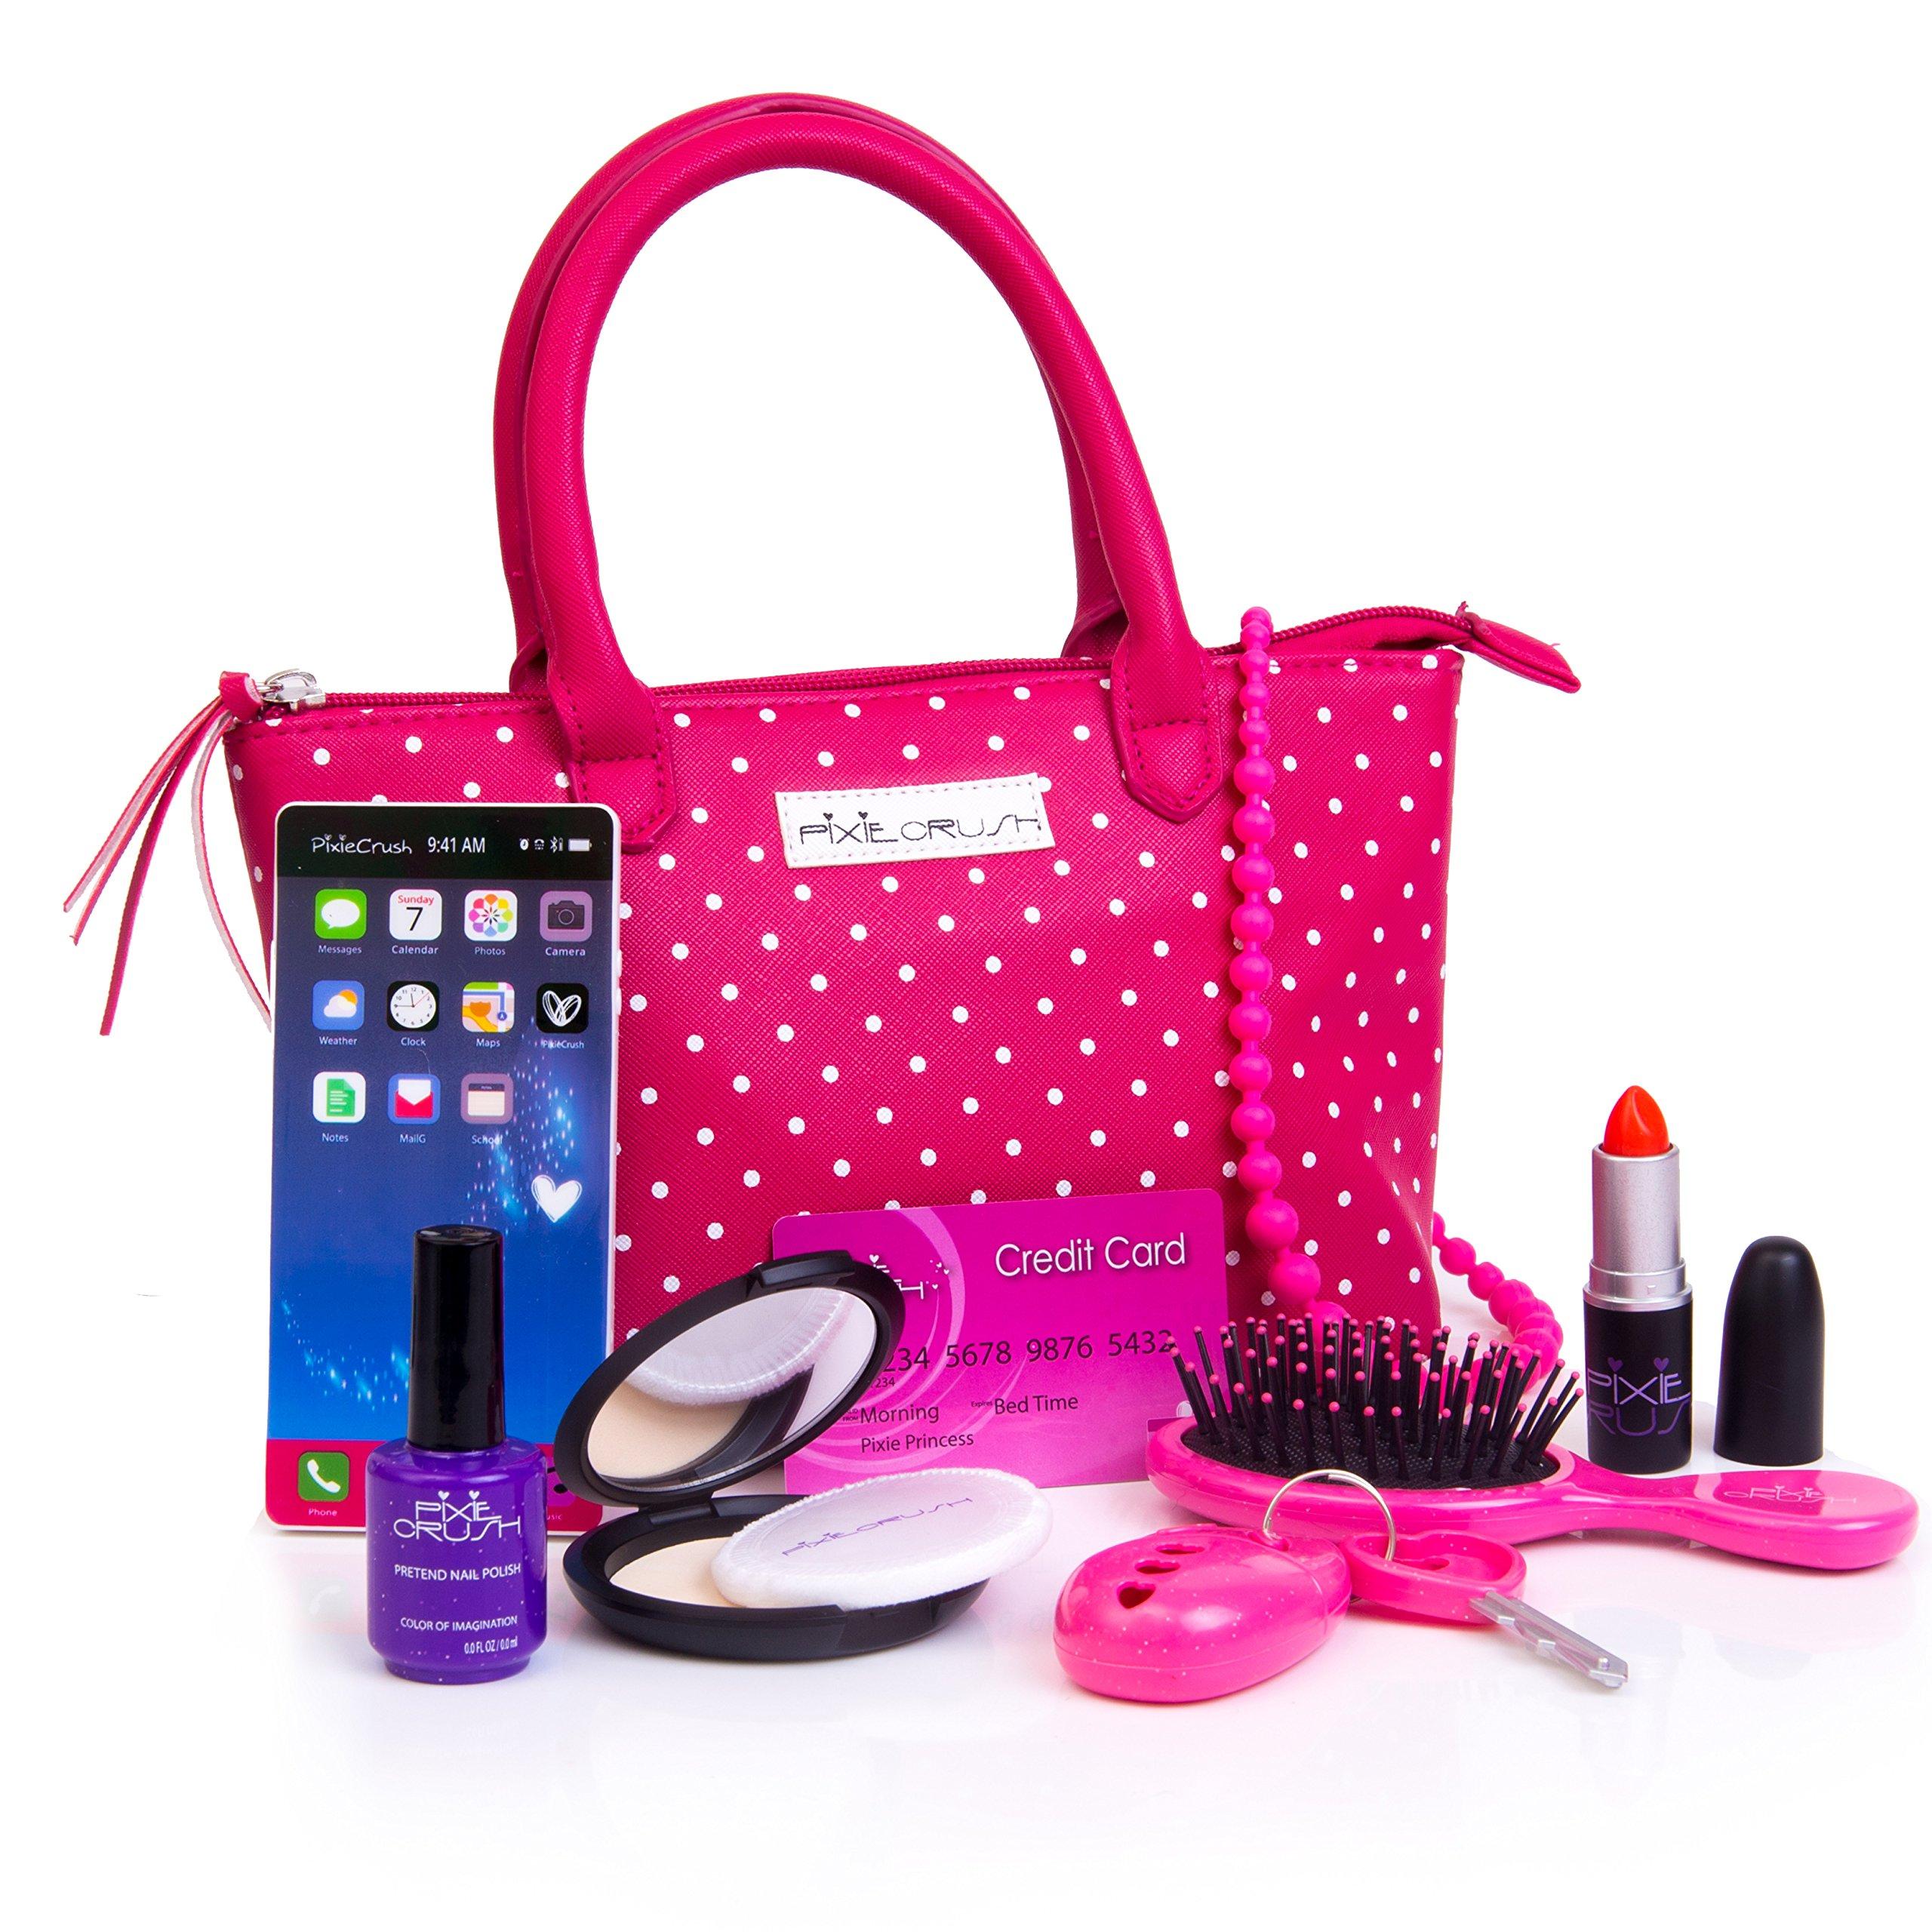 PixieCrush Pretend Play Kid Purse Set for Girls with Handbag, Pretend Smart Phone, Keys with Remote, Pretend Makeup, Lipstick – Interactive & Educational Toy (Pink Polka Dot/Standard)